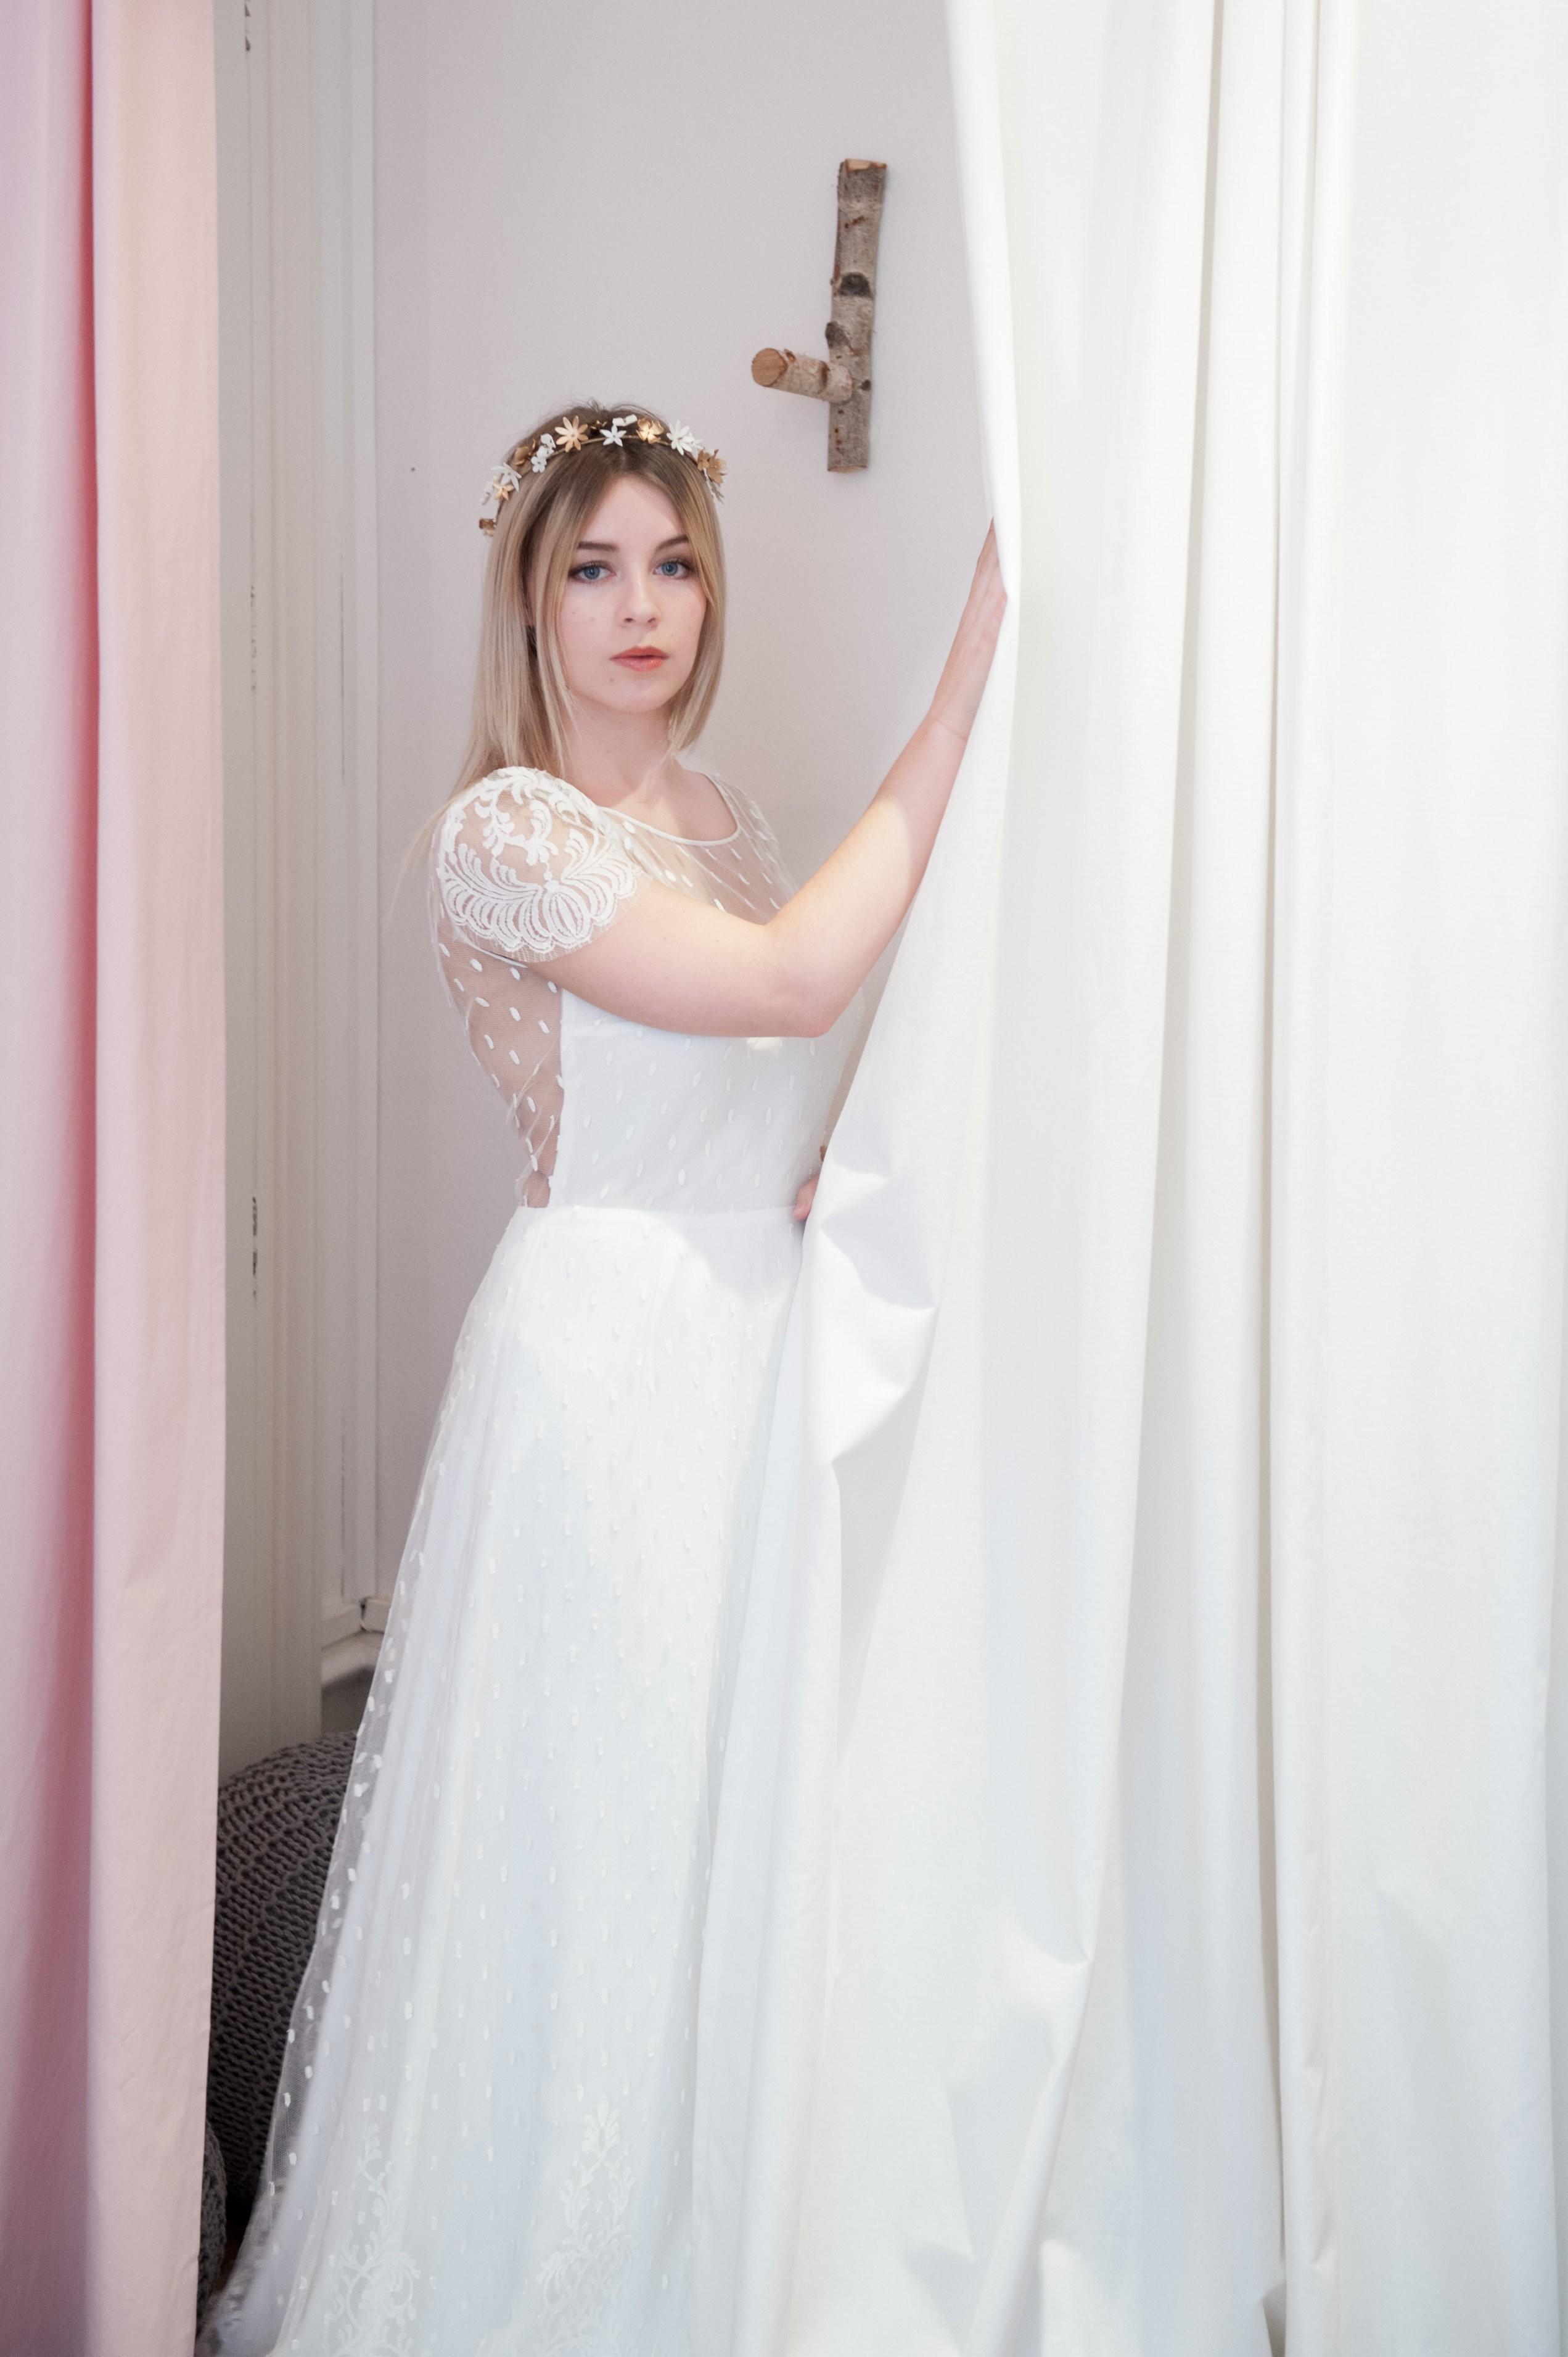 l adresse coeur mariage nantes robes de mariee lasoeurdelamariee blog mariage 27 la s ur de. Black Bedroom Furniture Sets. Home Design Ideas